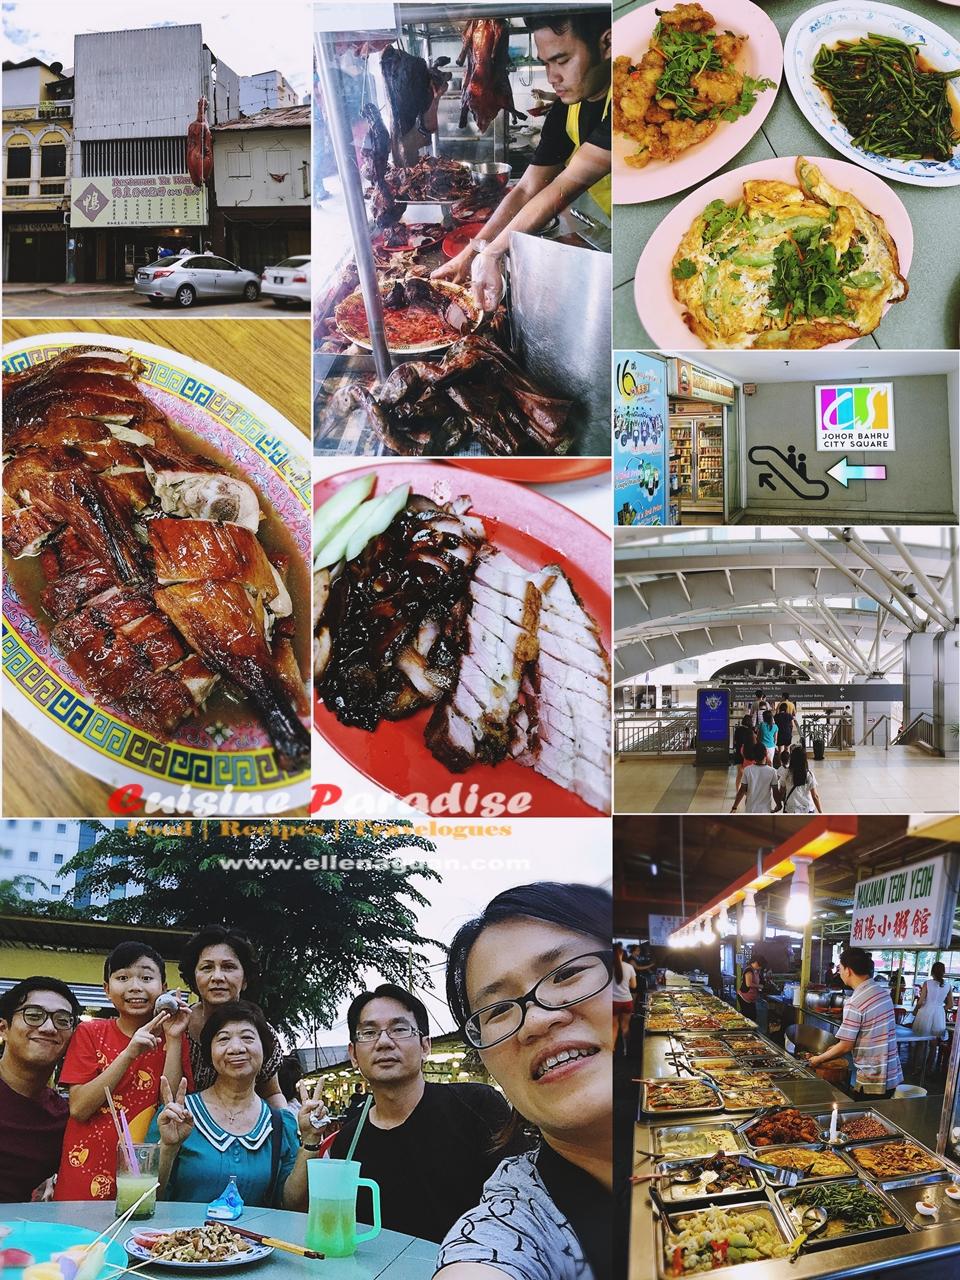 Cuisine paradise singapore food blog recipes reviews and travel jb johor bahru food trail malaysia forumfinder Gallery